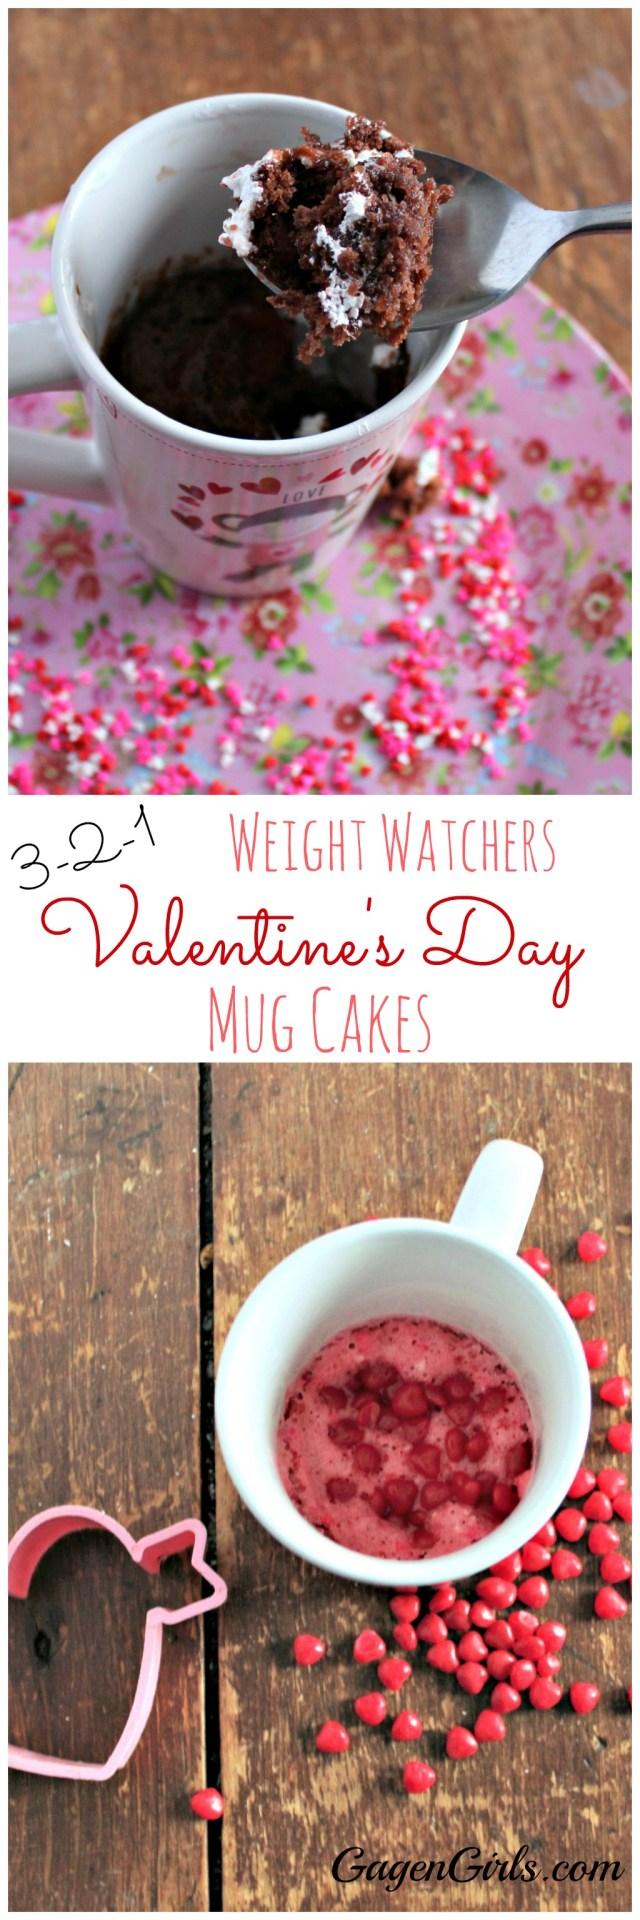 3-2-1 Weight Watchers Valentine's Day Mug Cakes